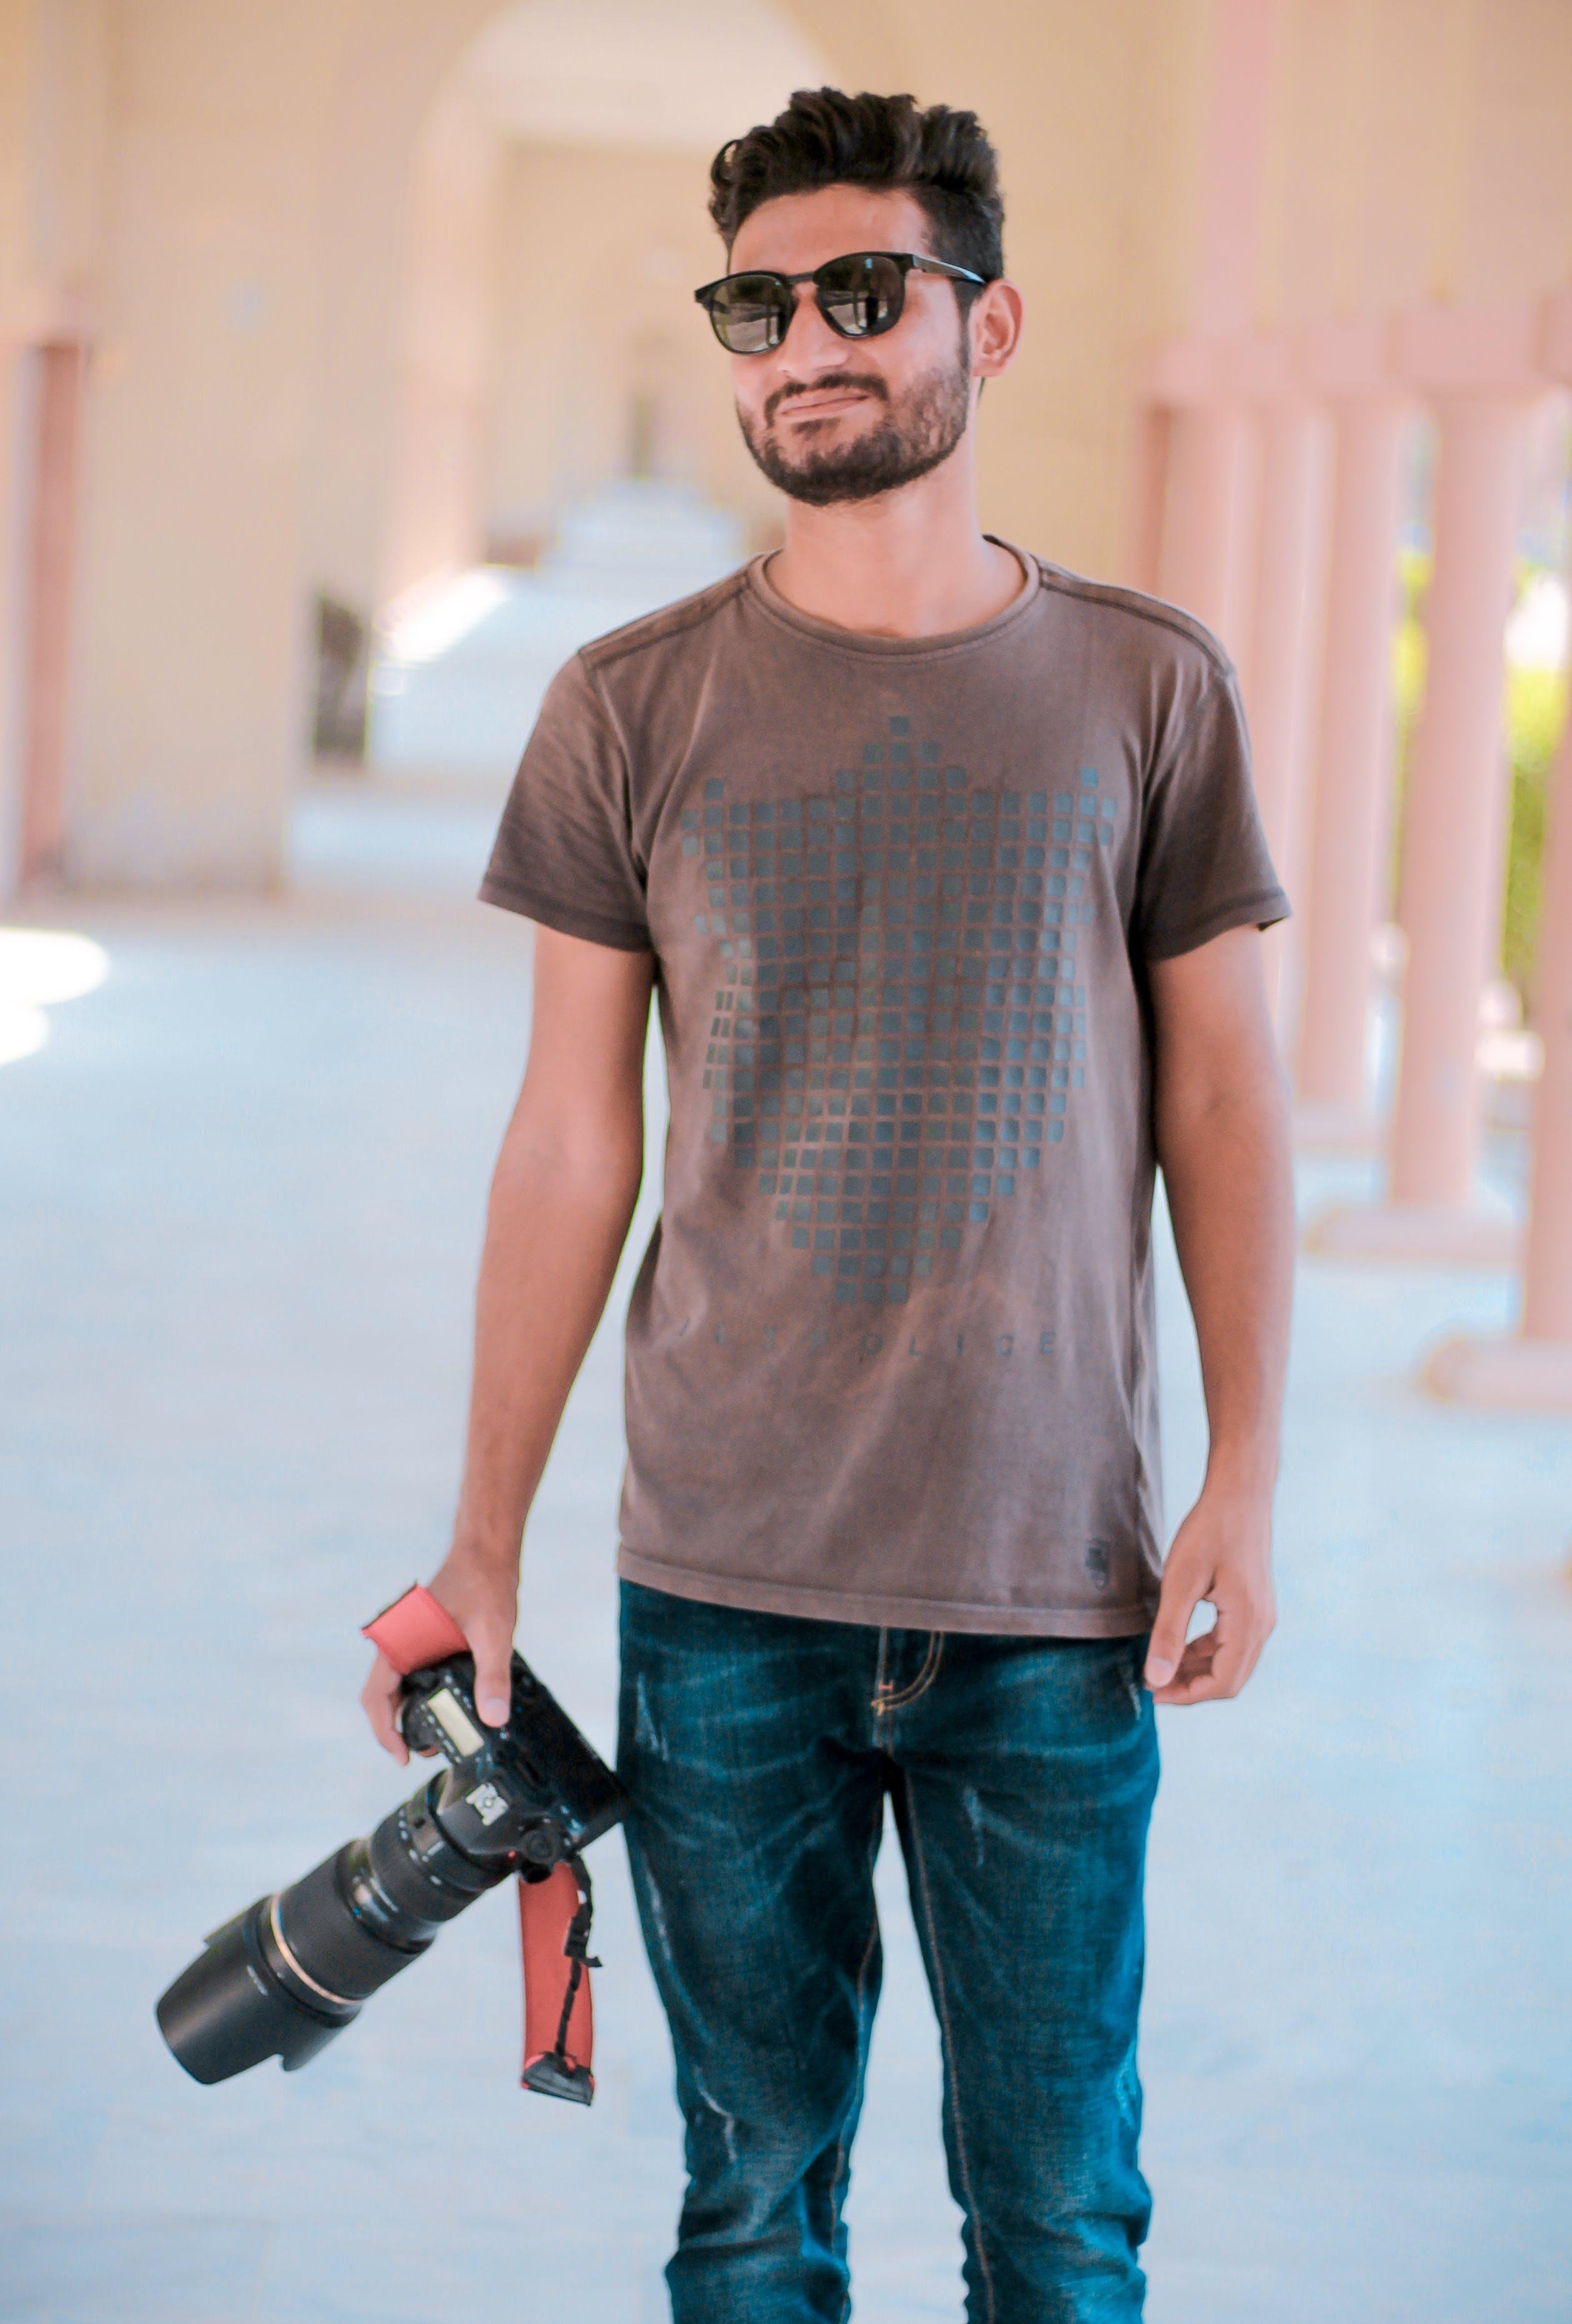 beard, boy, camera